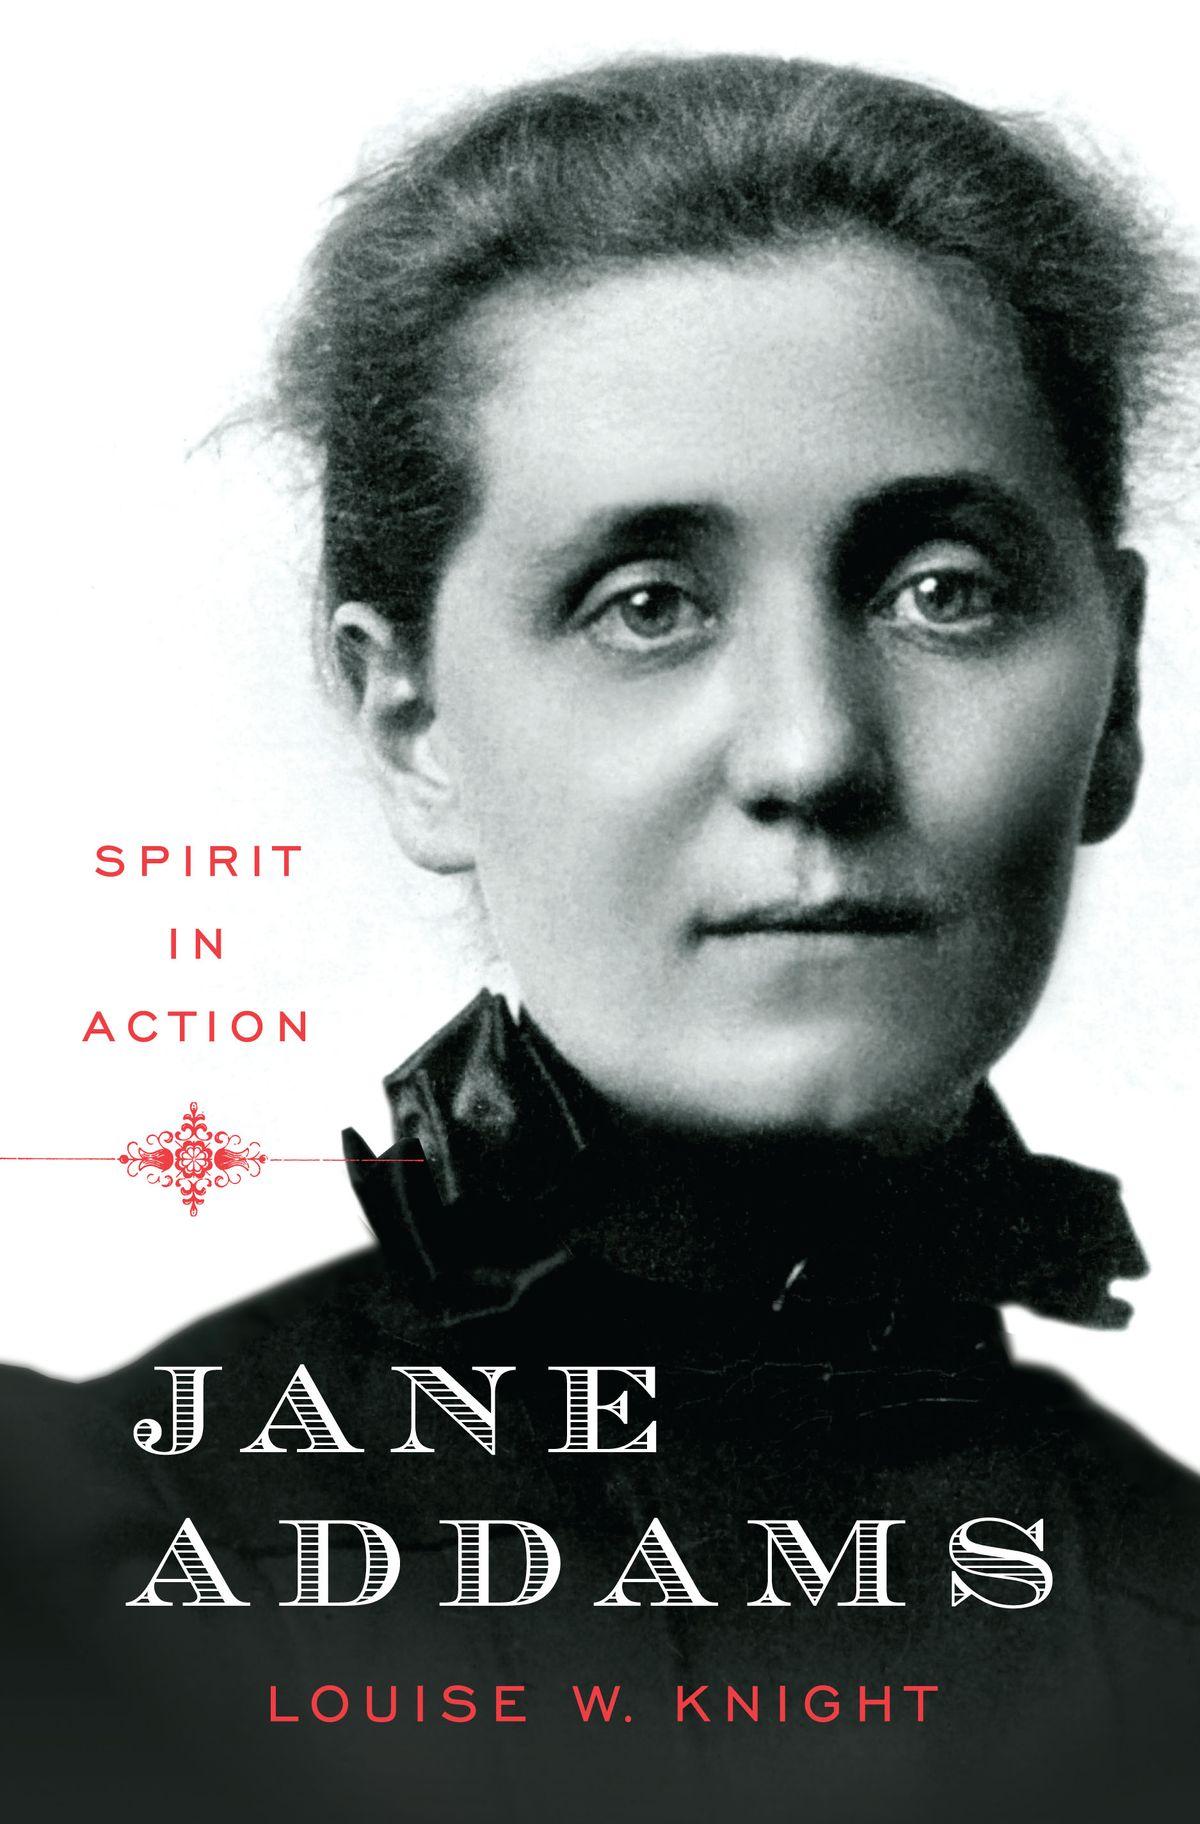 Jane Addams by Louise W. Knight